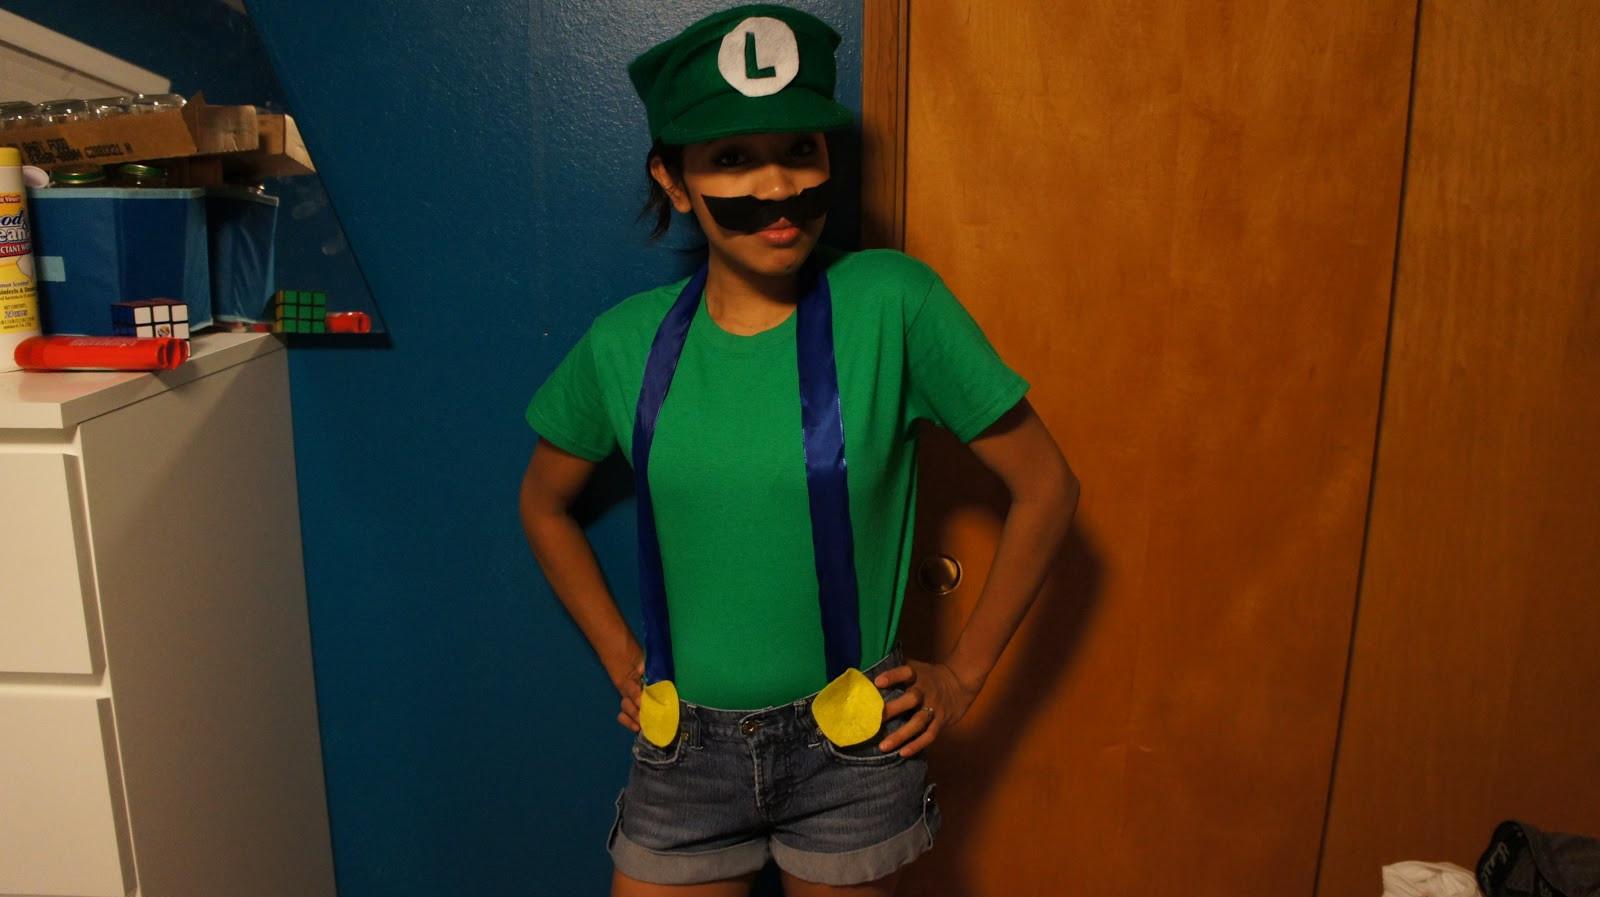 Best ideas about Mario DIY Costume . Save or Pin DIY Mario & Luigi Costumes Now.